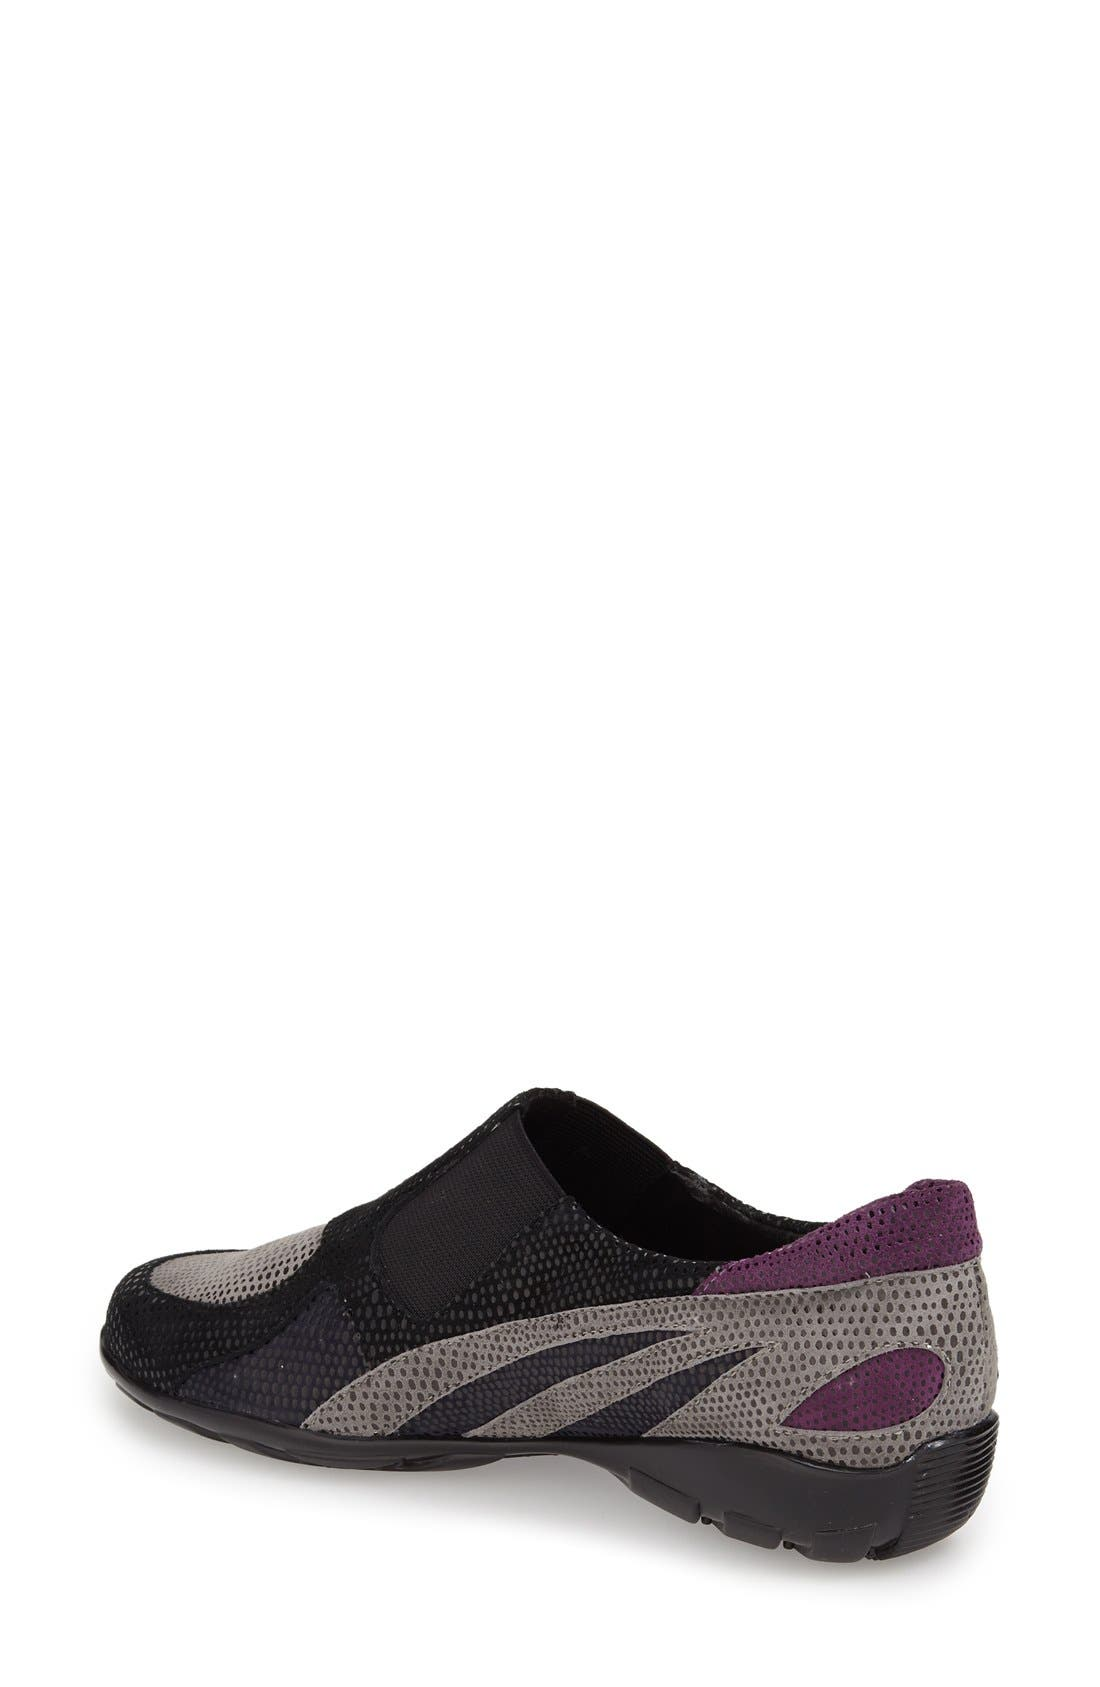 'Atte' Sneaker,                             Alternate thumbnail 4, color,                             001